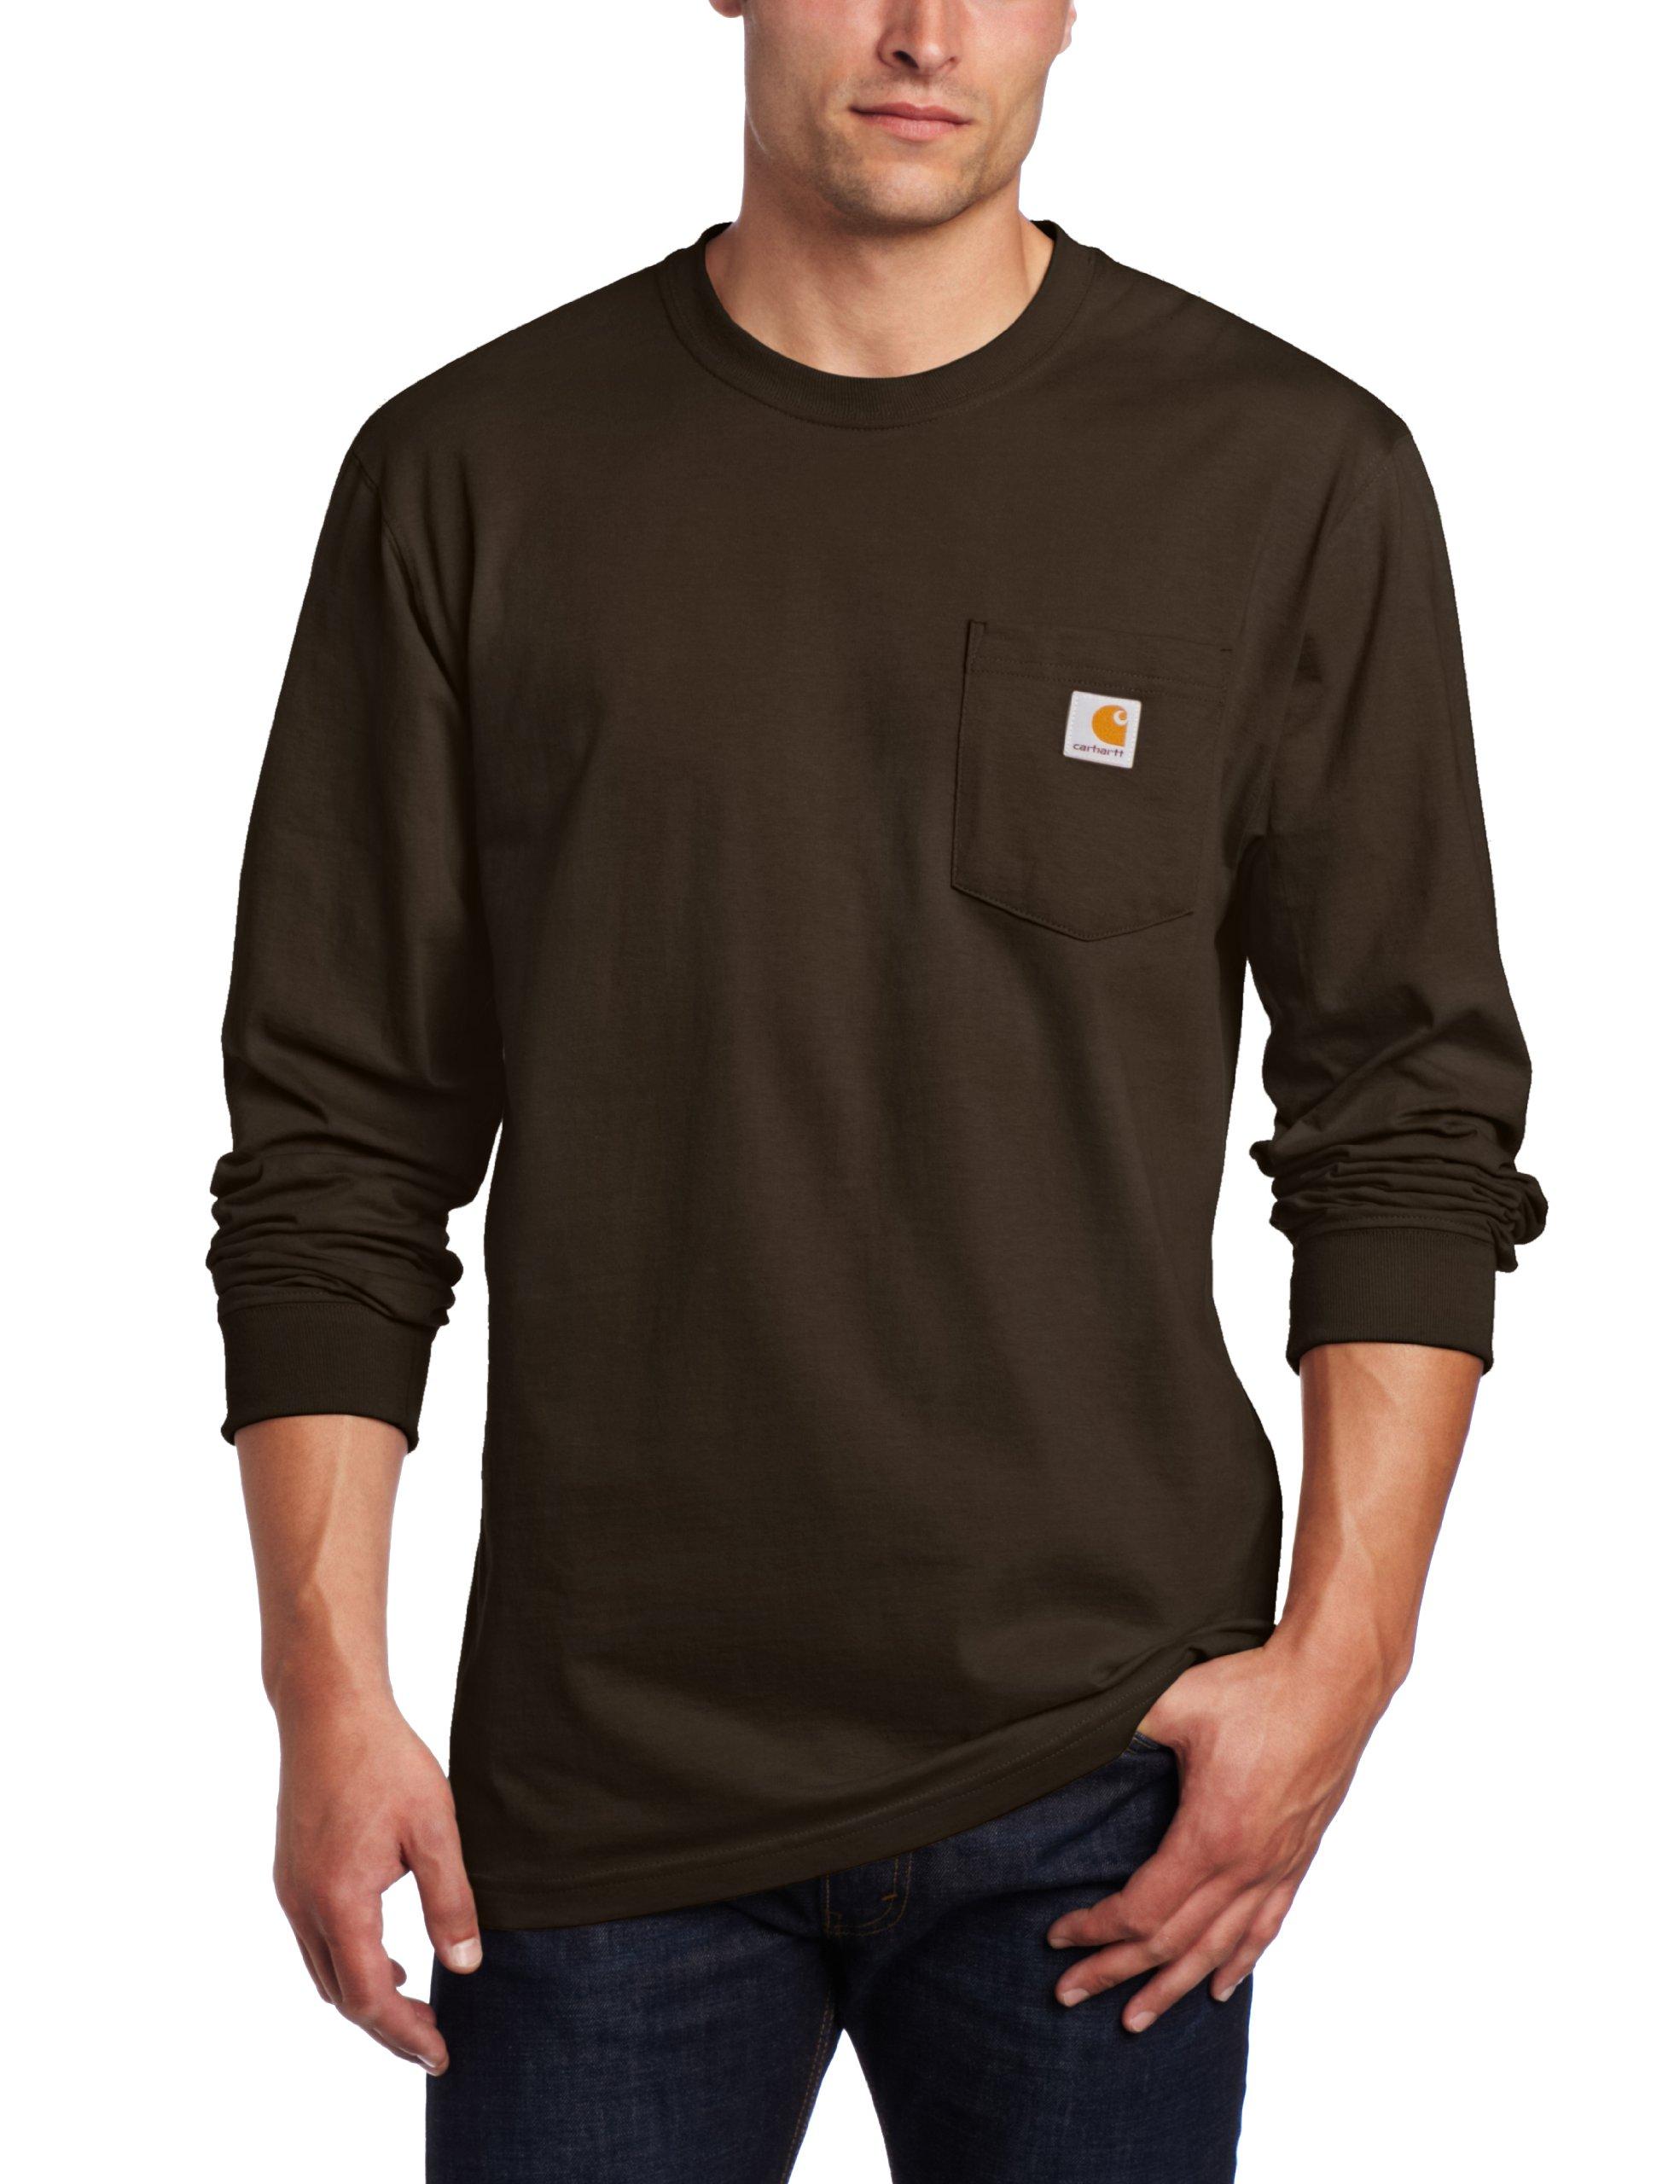 Carhartt Men's Tall Pocket Longsleeve Workwear T-Shirt,Dark Brown,XXX-Large